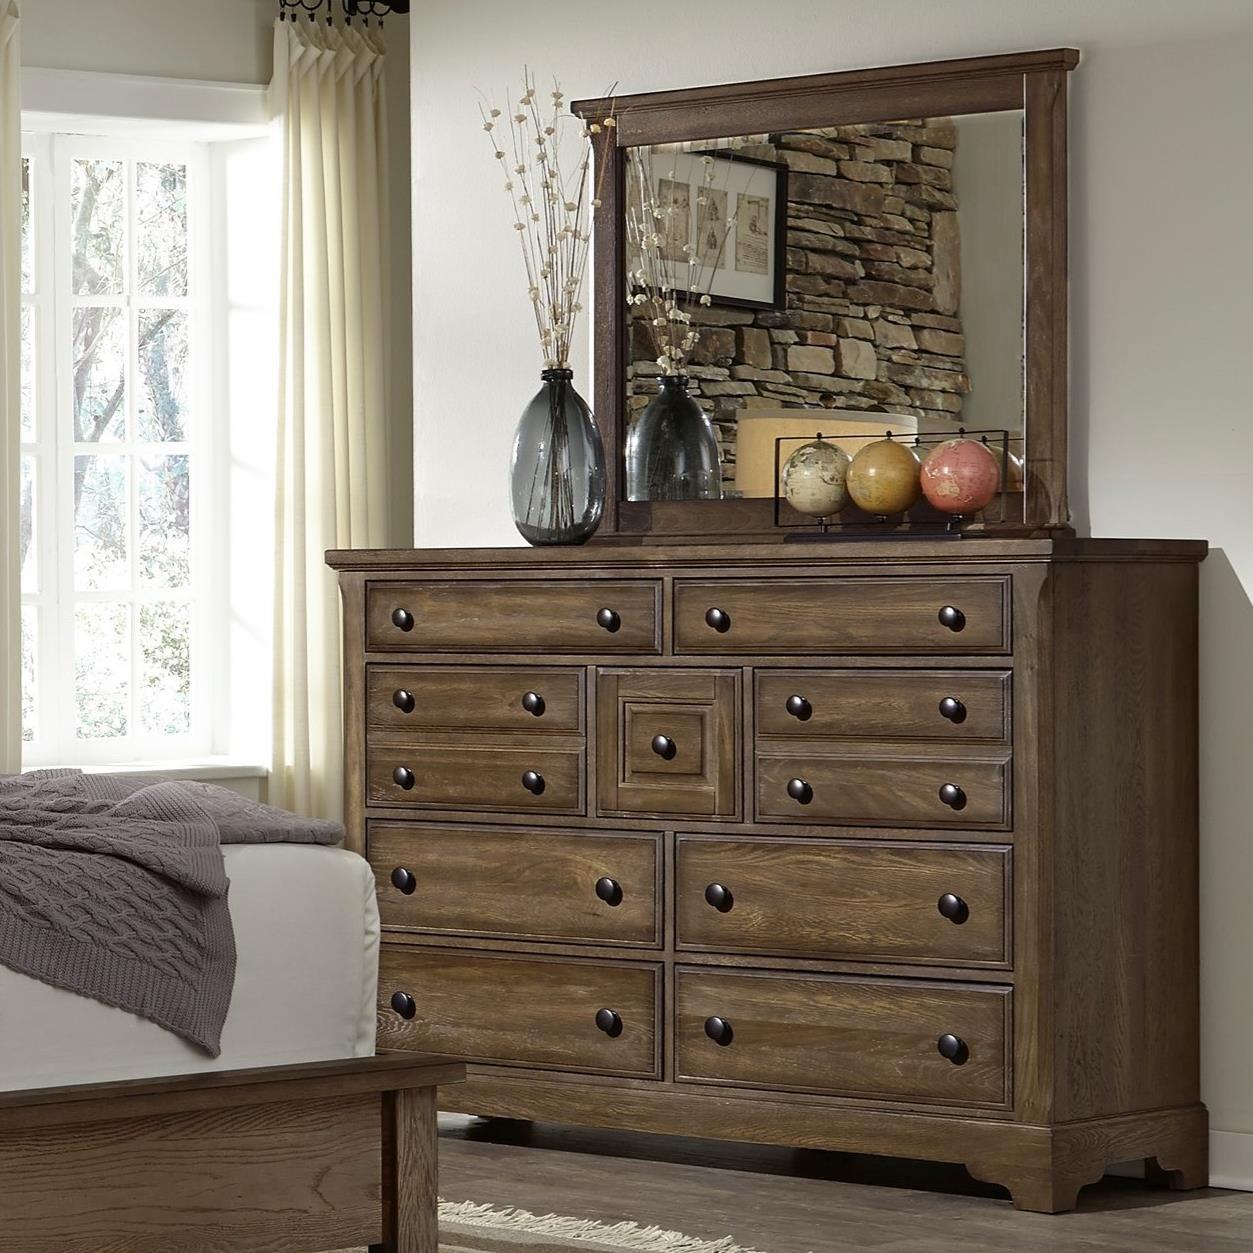 Artisan Choices Villa Triple Dresser & Landscape Mirror by Artisan & Post at Lapeer Furniture & Mattress Center